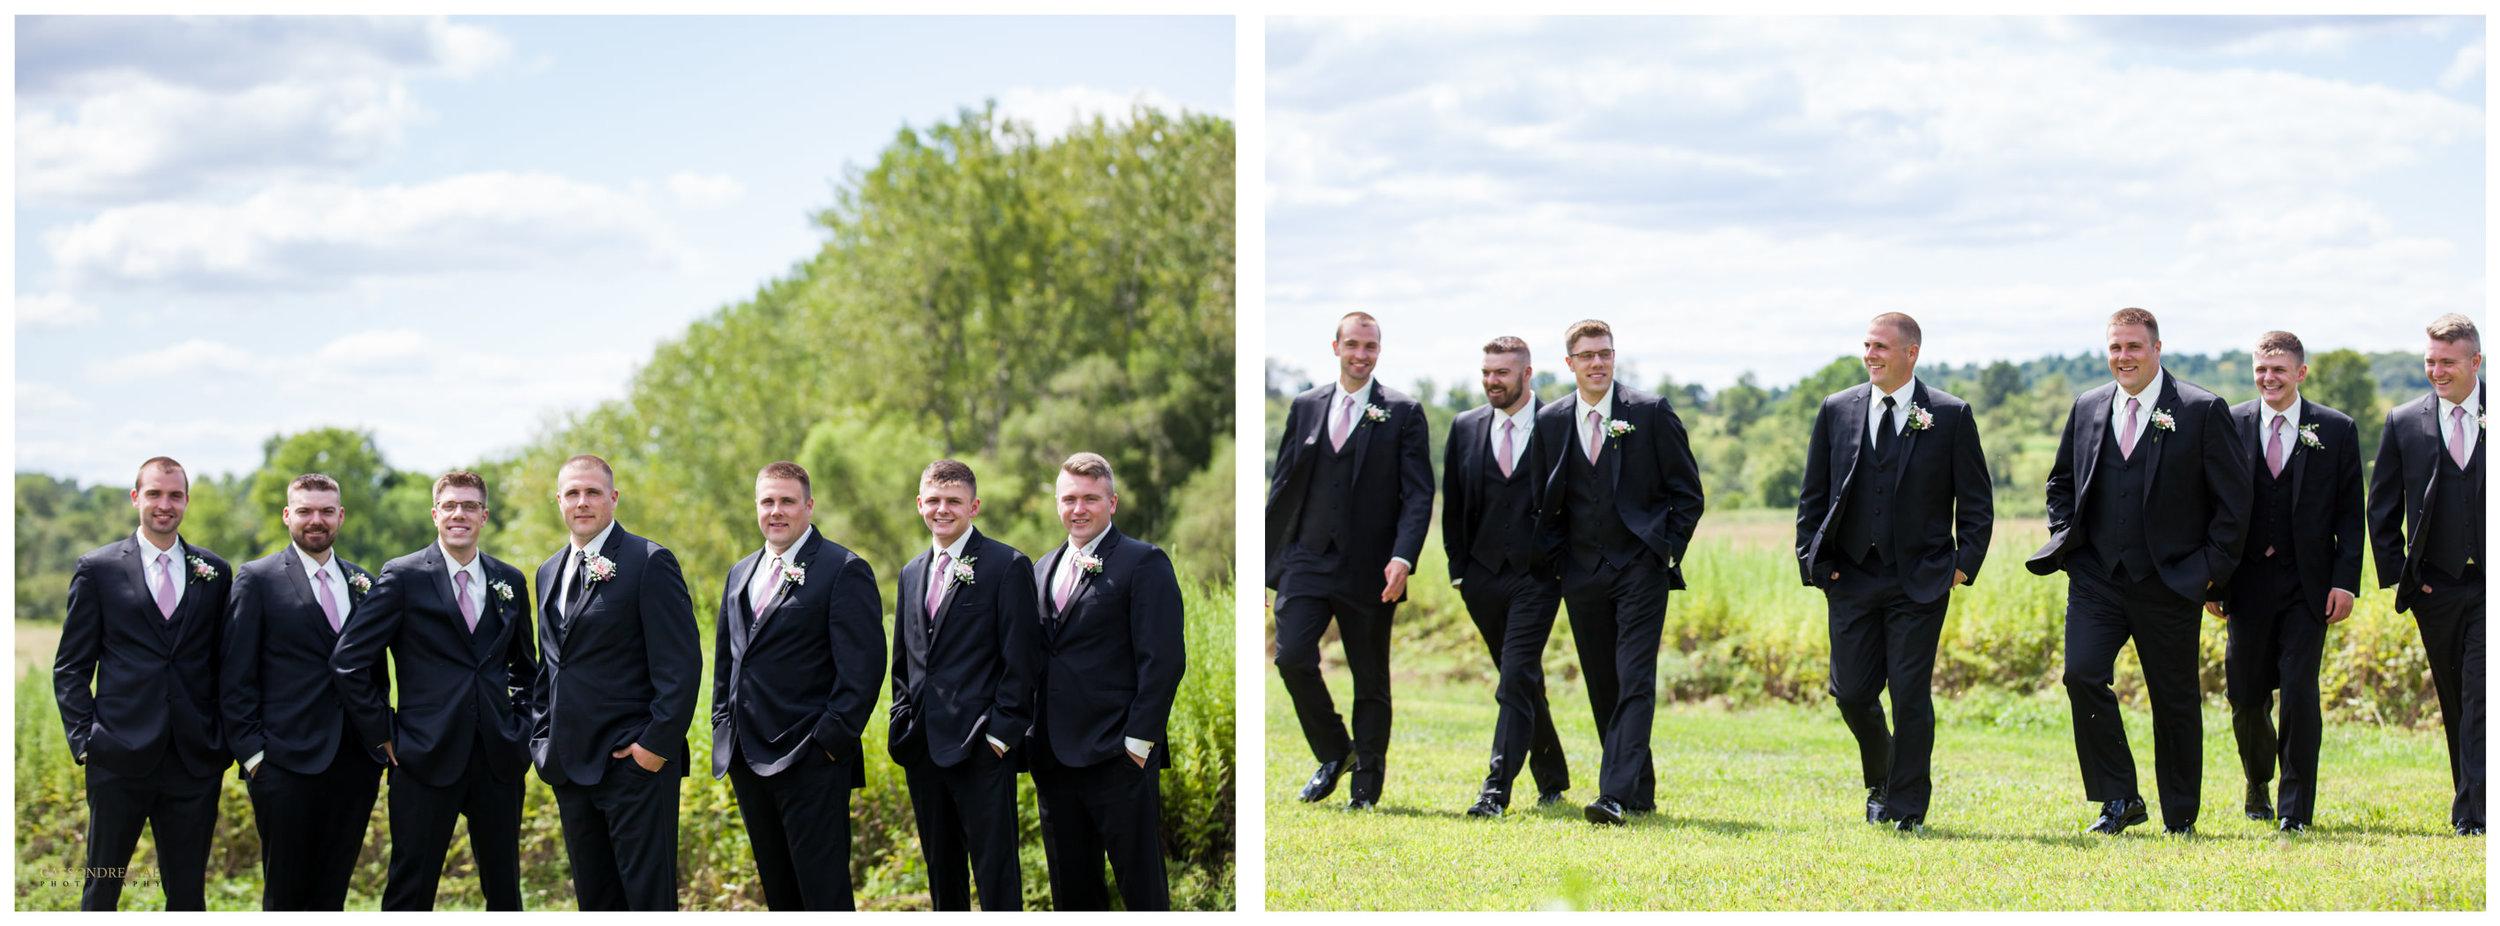 Cassondre Mae Photography The Links Wedding Photographer 15.jpg